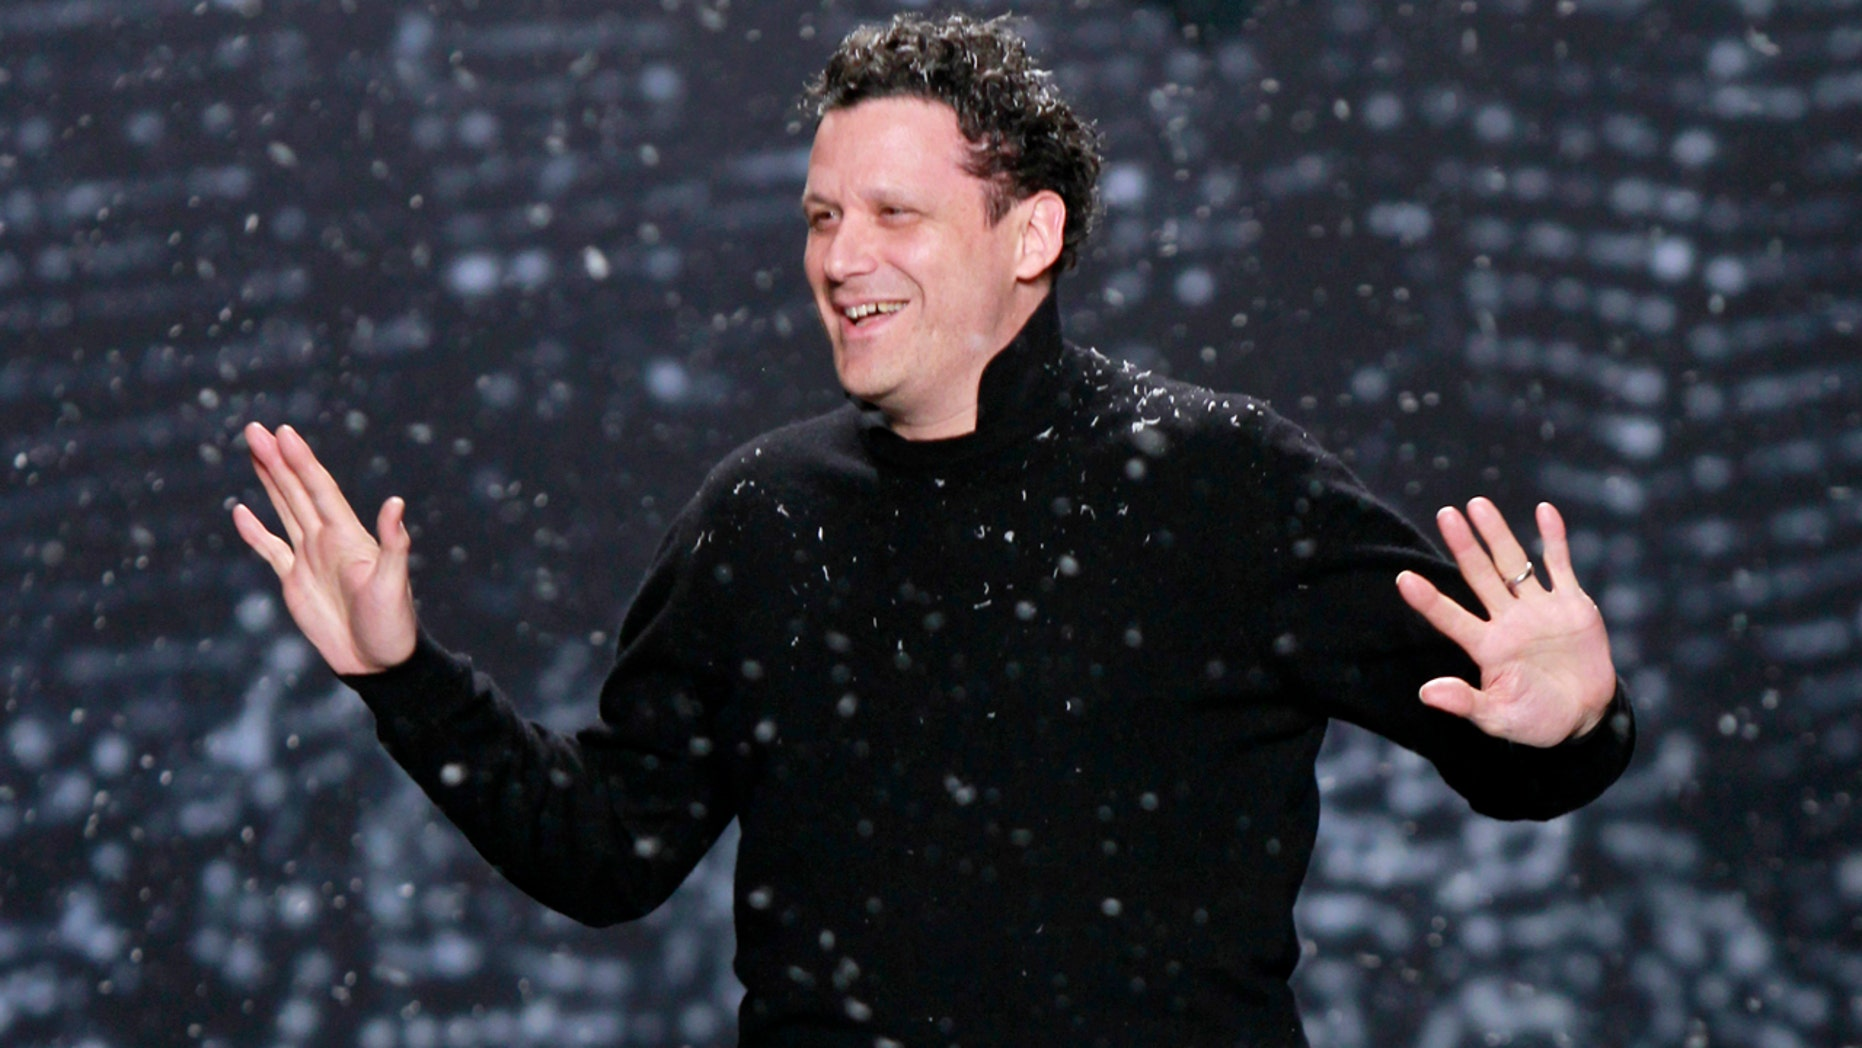 Designer Isaac Mizrahi acknowledges the crowd following his Fall 2010 fashion show at New York Fashion Week, February 18, 2010.   REUTERS/Brendan McDermid (UNITED STATES - Tags: FASHION) - GM1E62J0HQ501